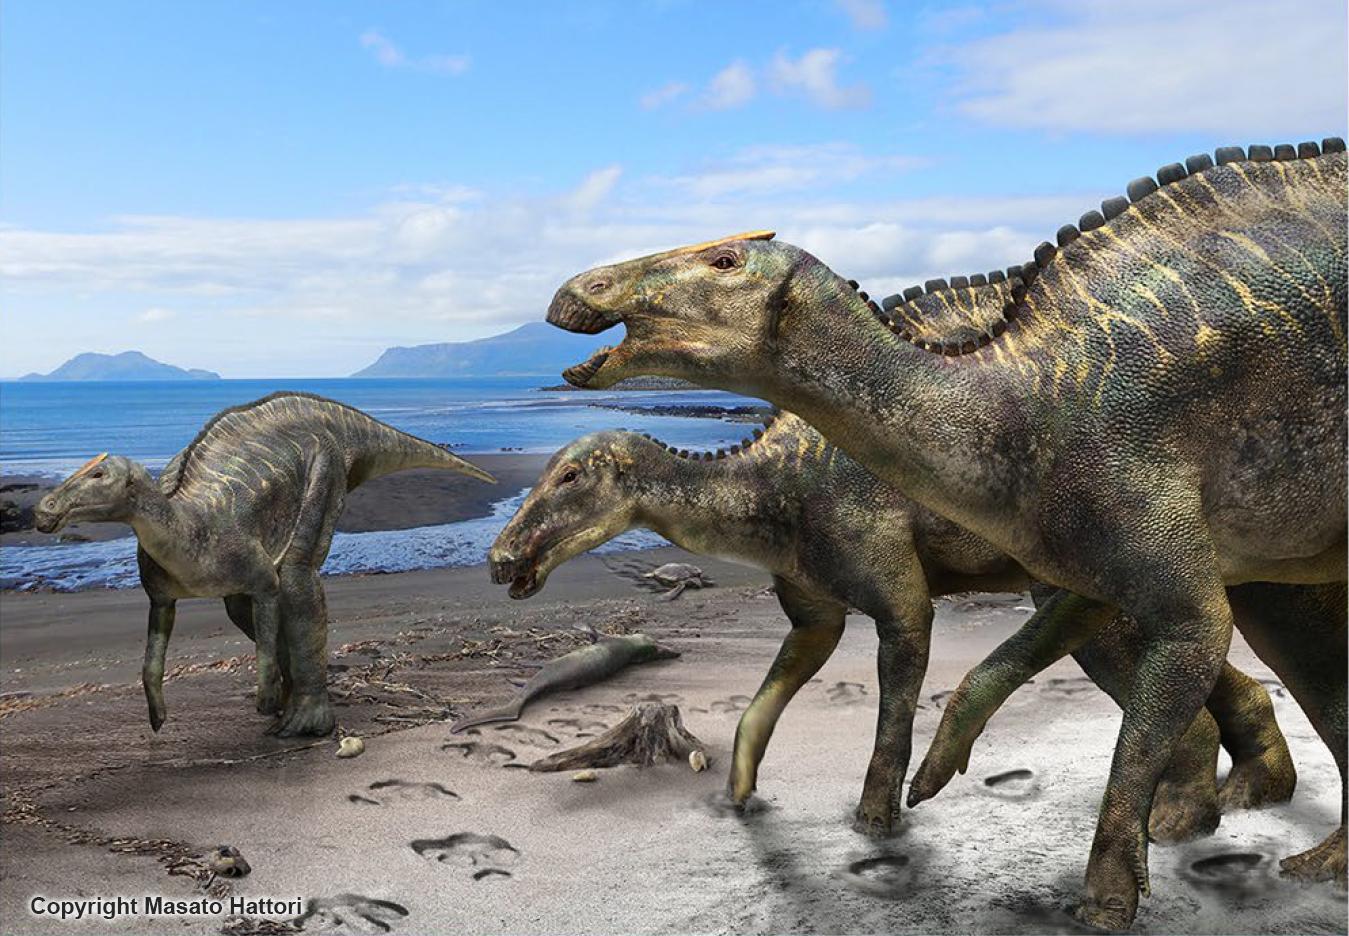 Fantastisk A new duck-billed dinosaur, Kamuysaurus japonicus, identified GH-69